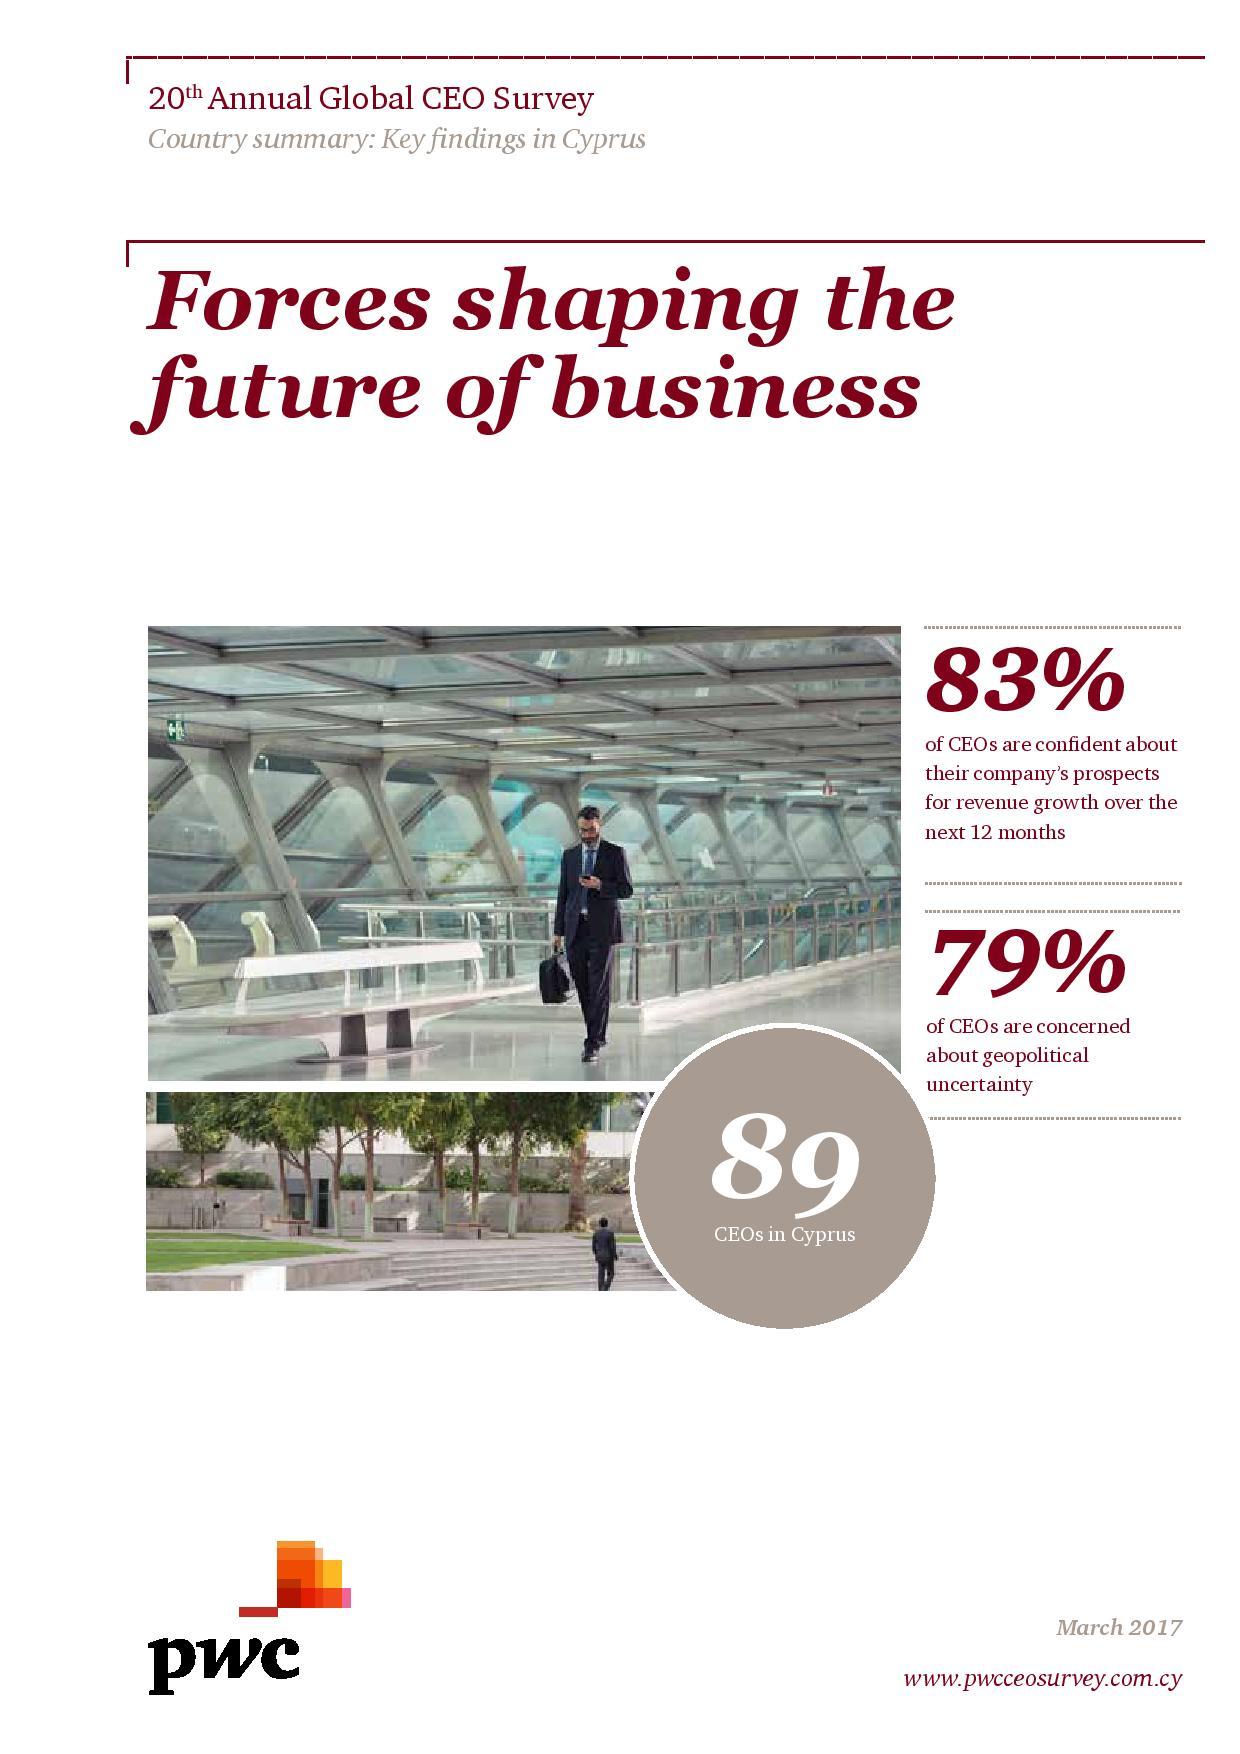 PwC: 20th Annual Global CEO Survey